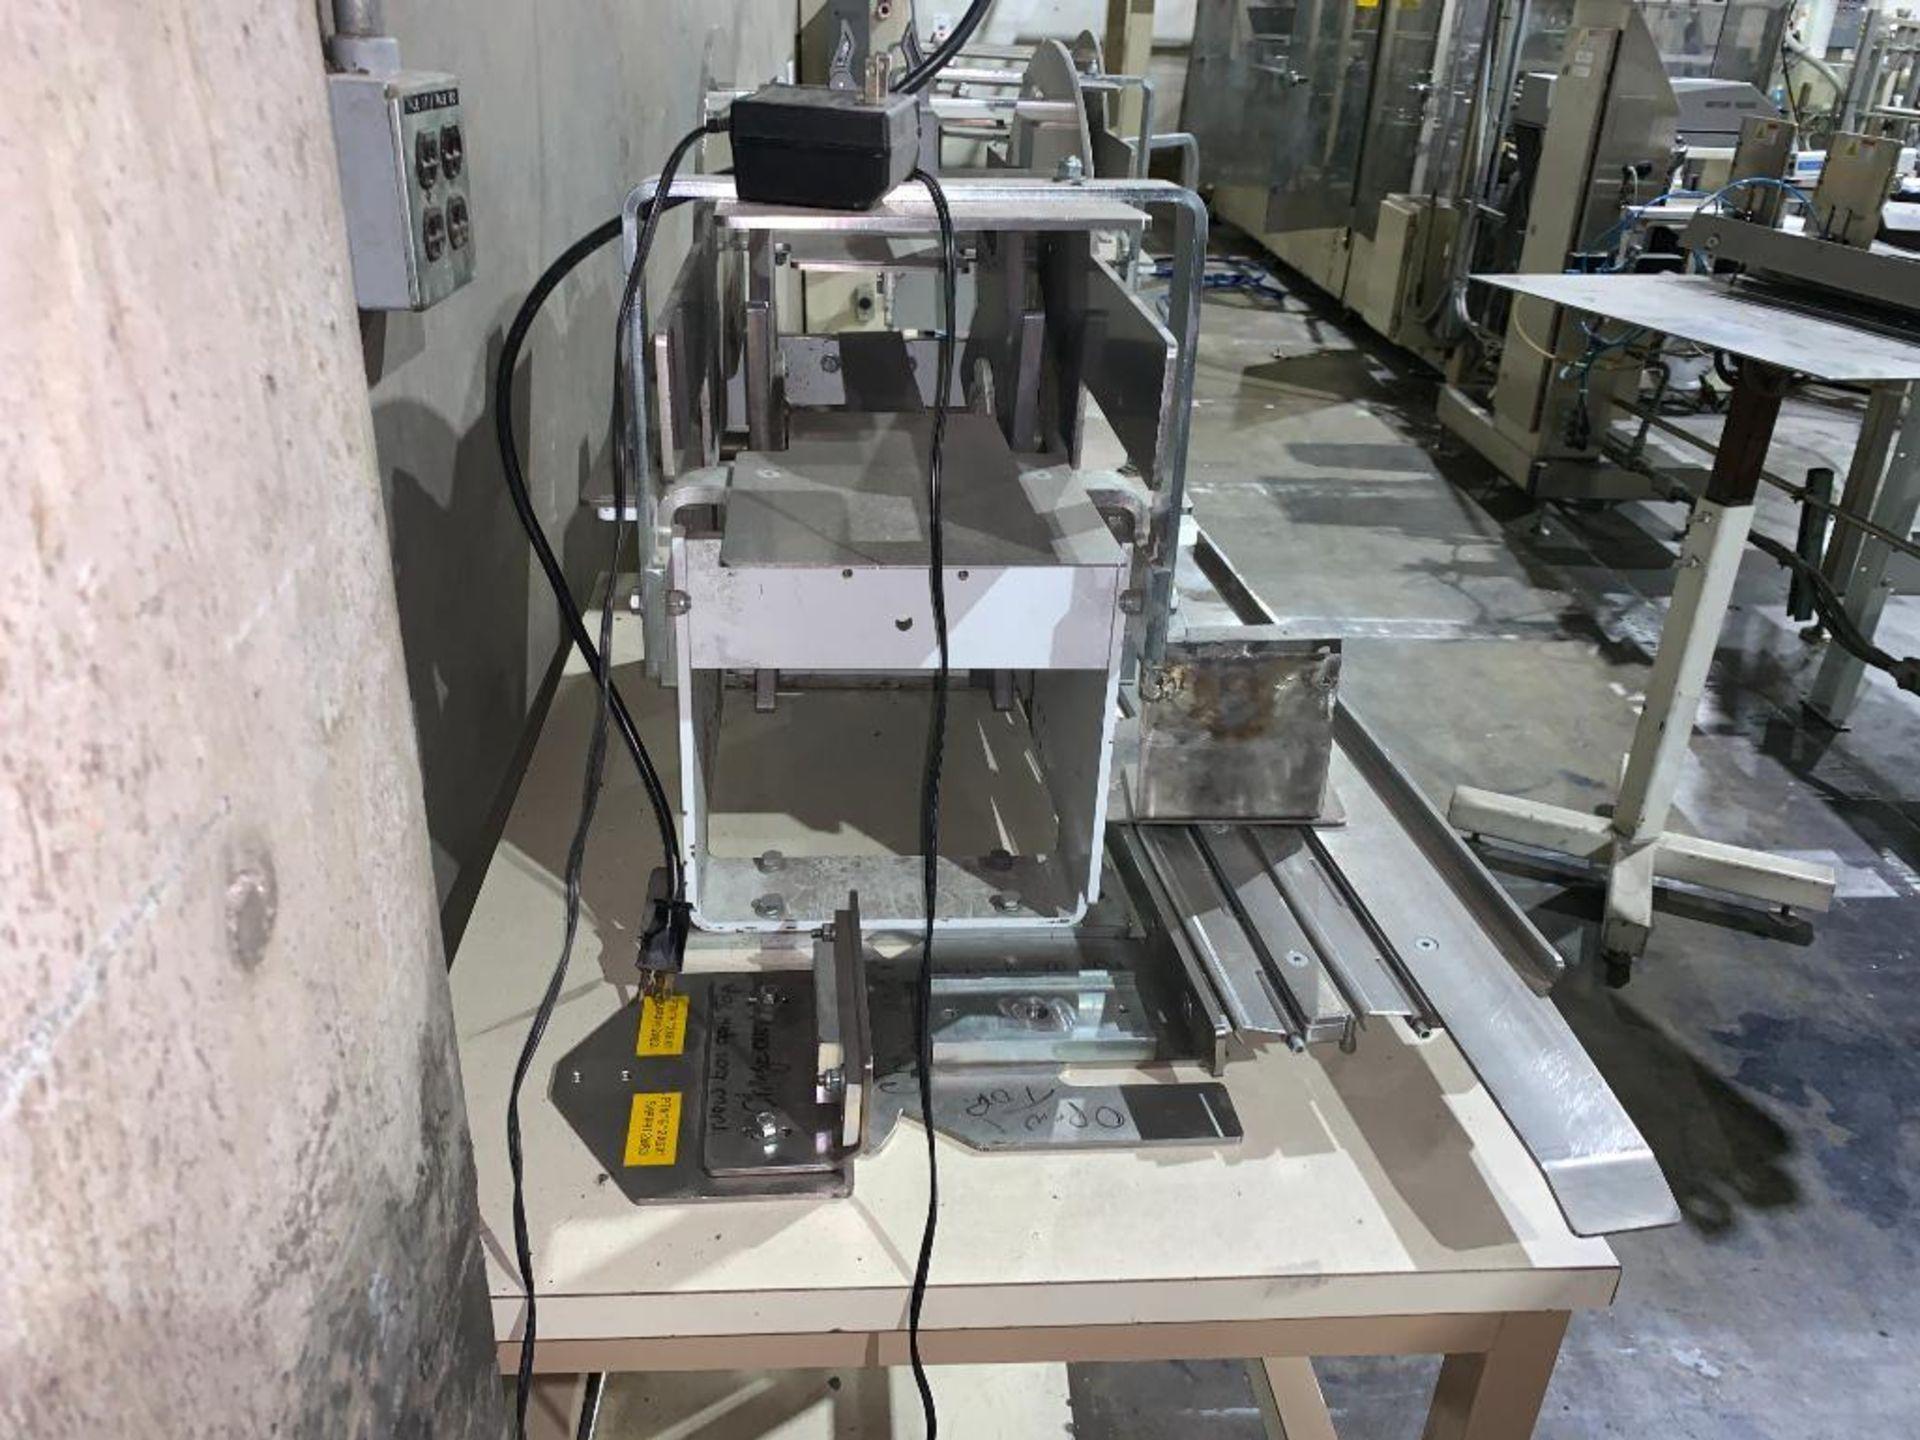 mild steel belt conveyor, 68 in. x 10 in., with box conditioner - Image 12 of 13